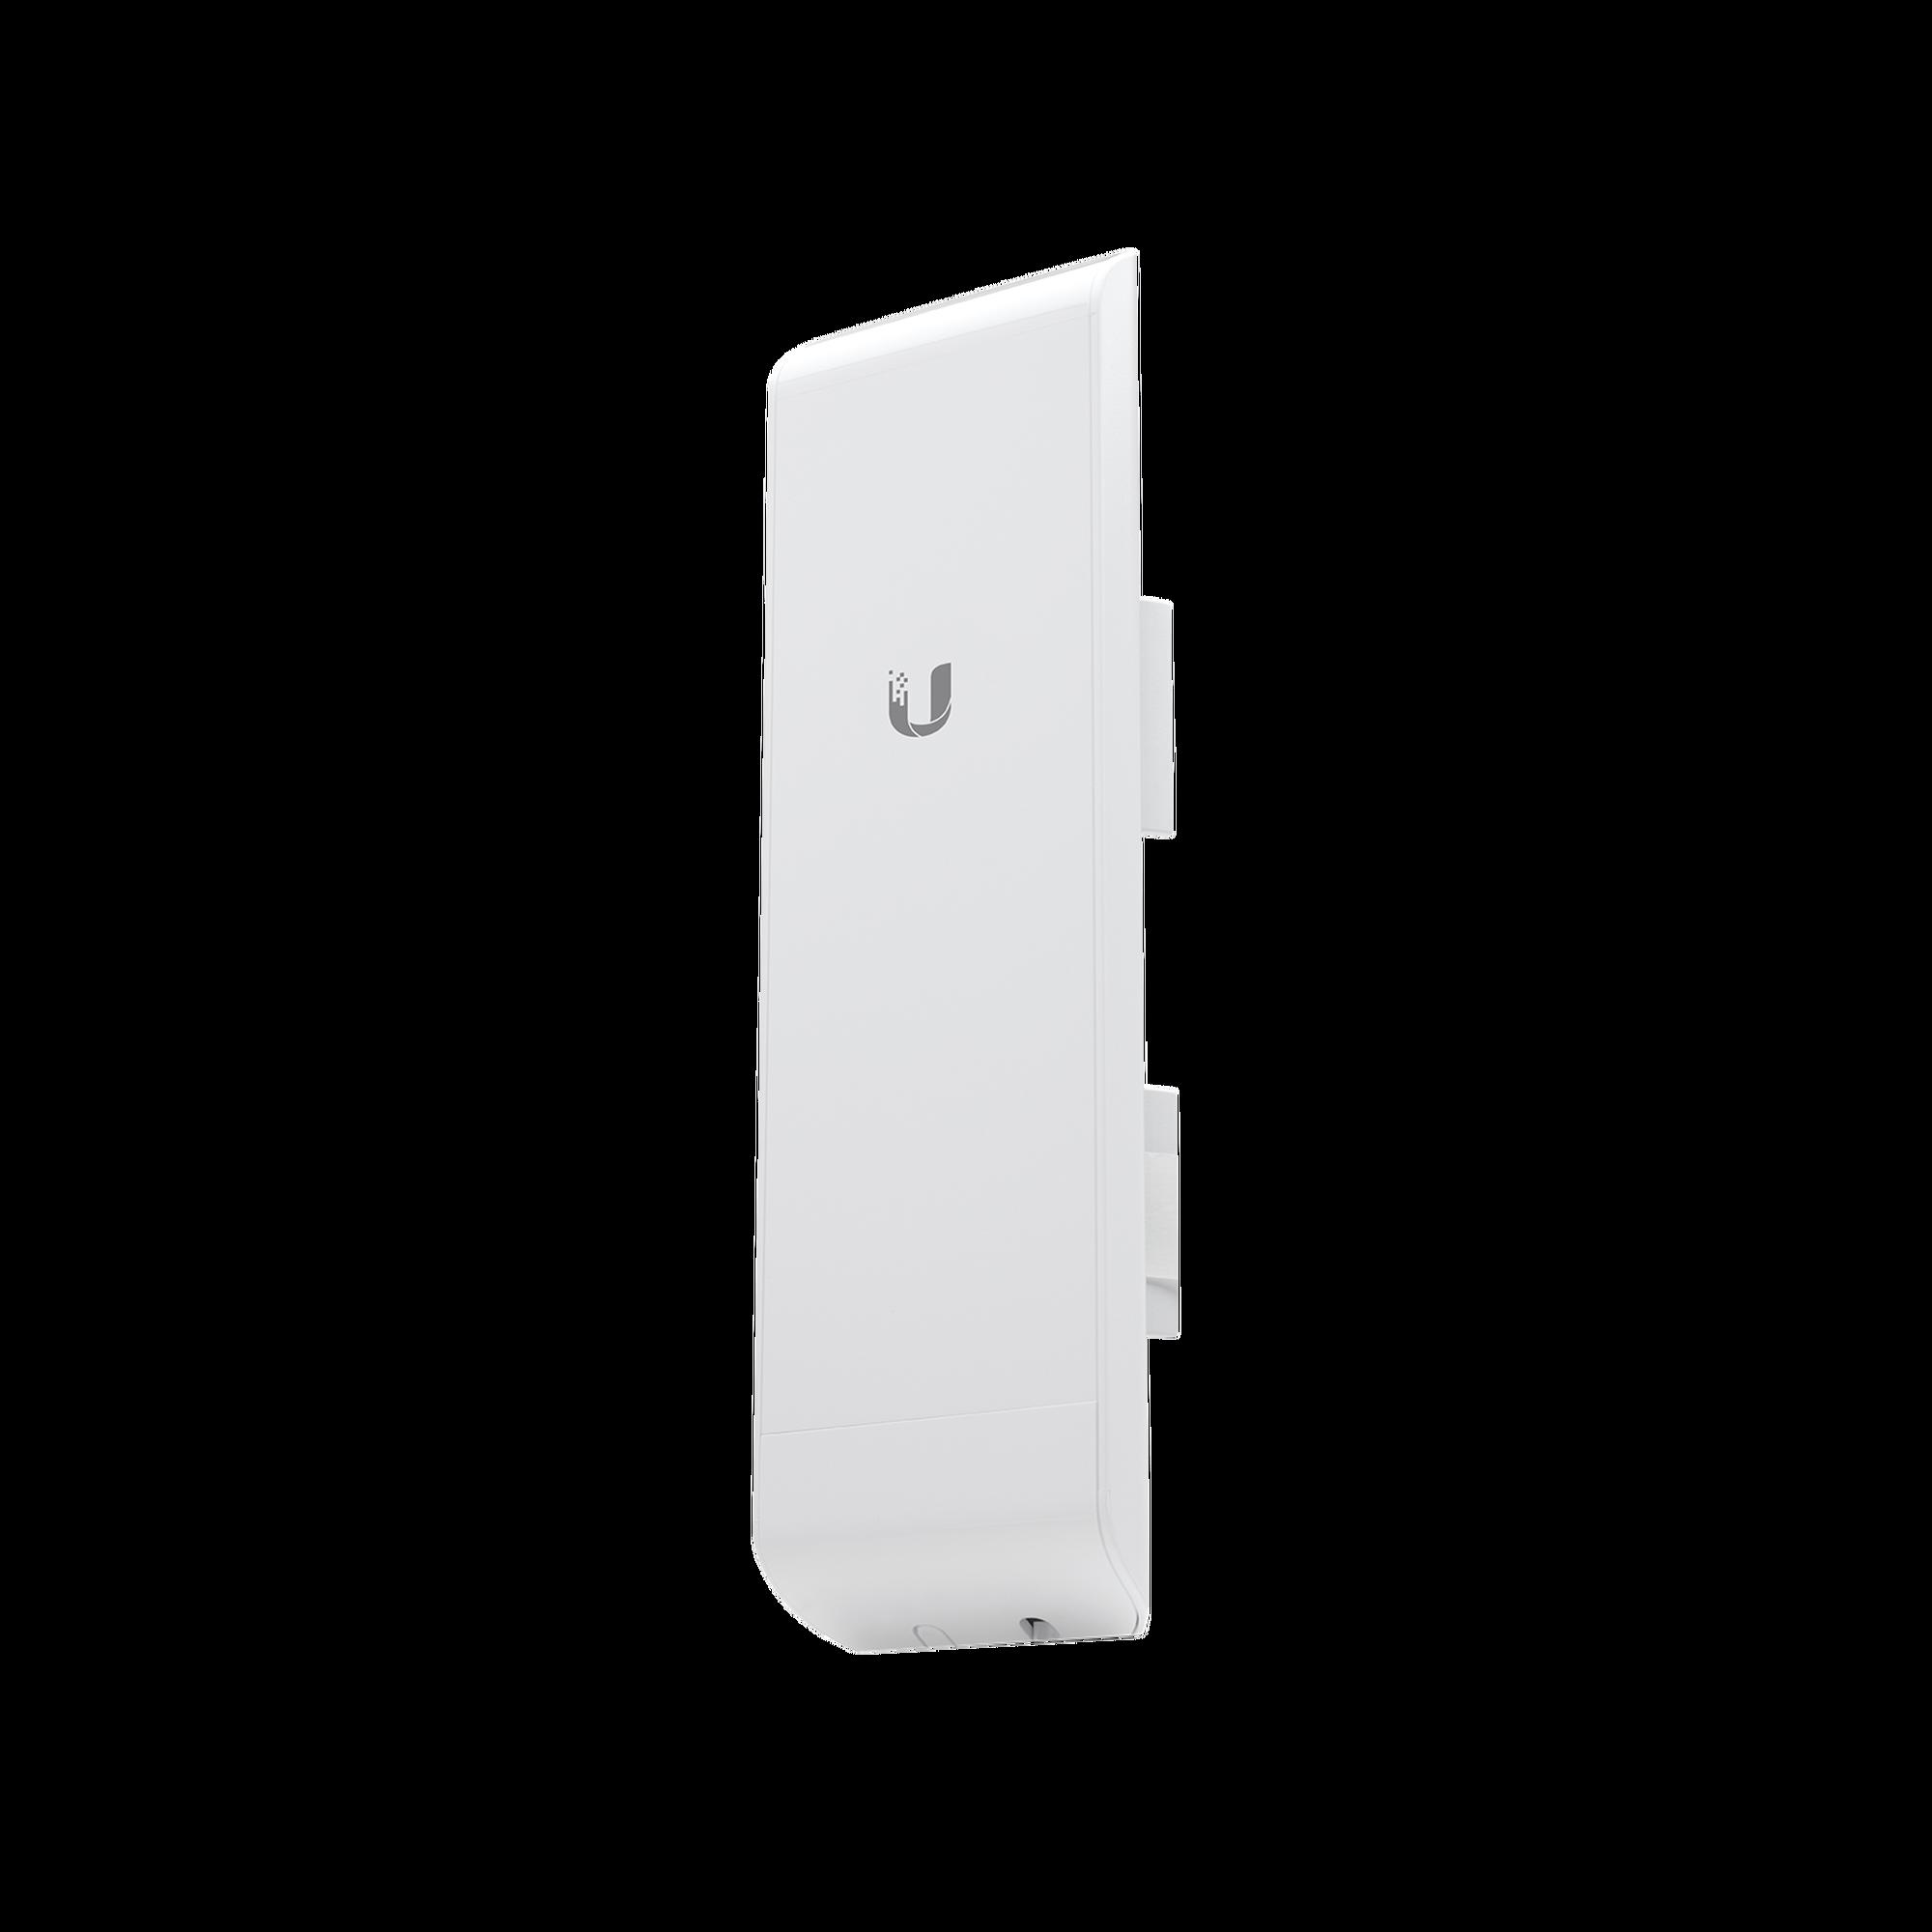 NanoStation airMAX M3 CPE,  hasta 150 Mbps, frecuencia 3 GHz (3400-3700 MHz) con antena integrada de 13 dBi